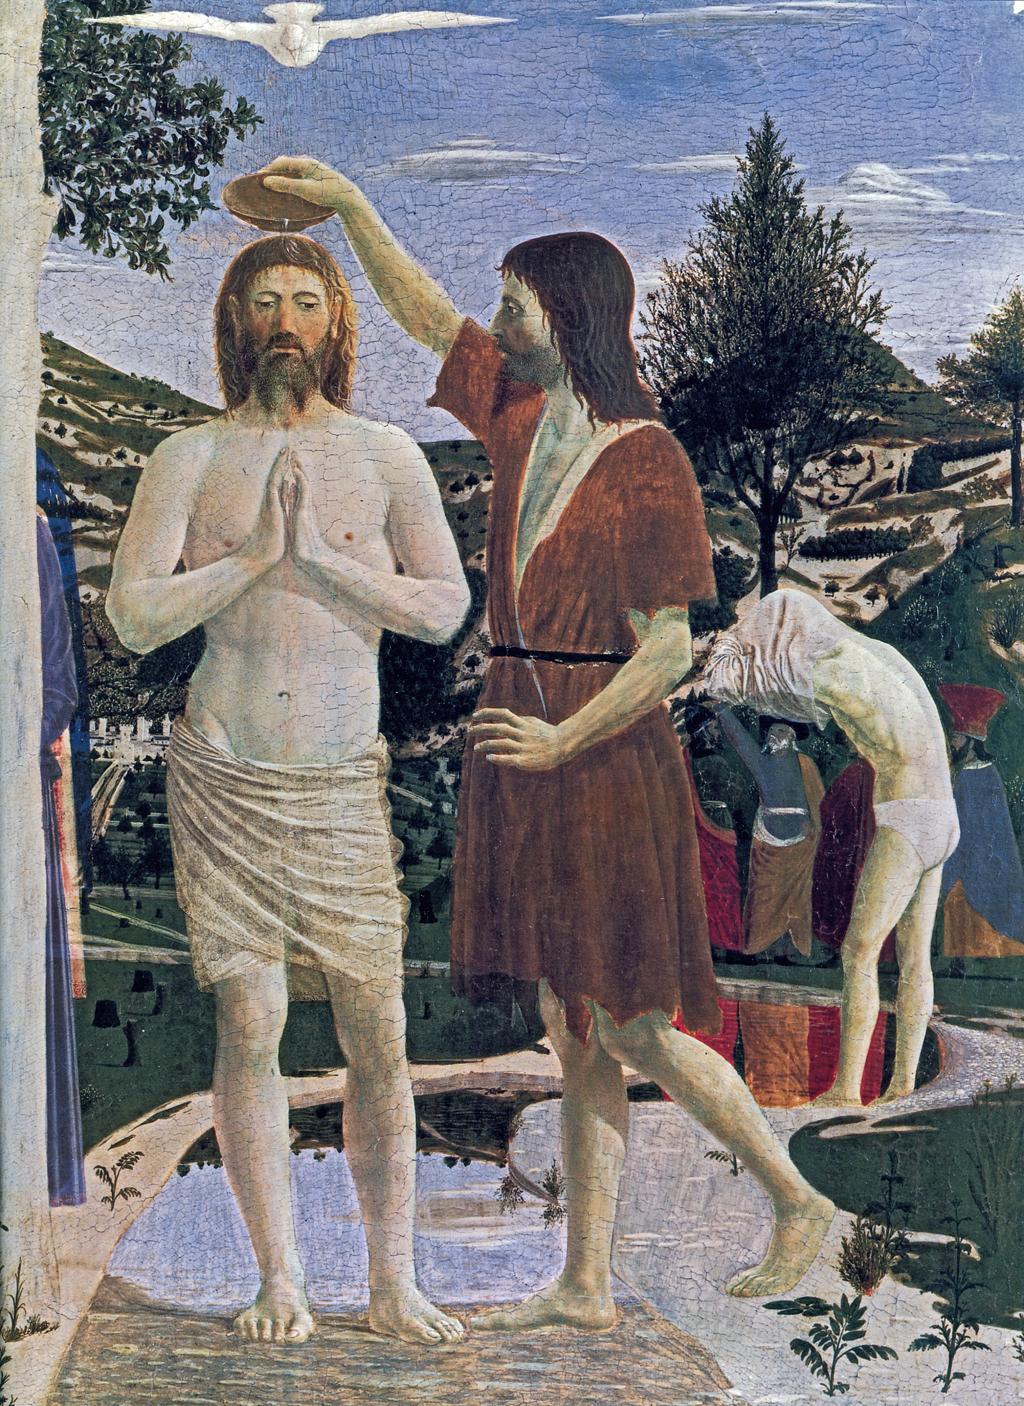 baptism of christ detail 1450 piero della francesca wikiart org